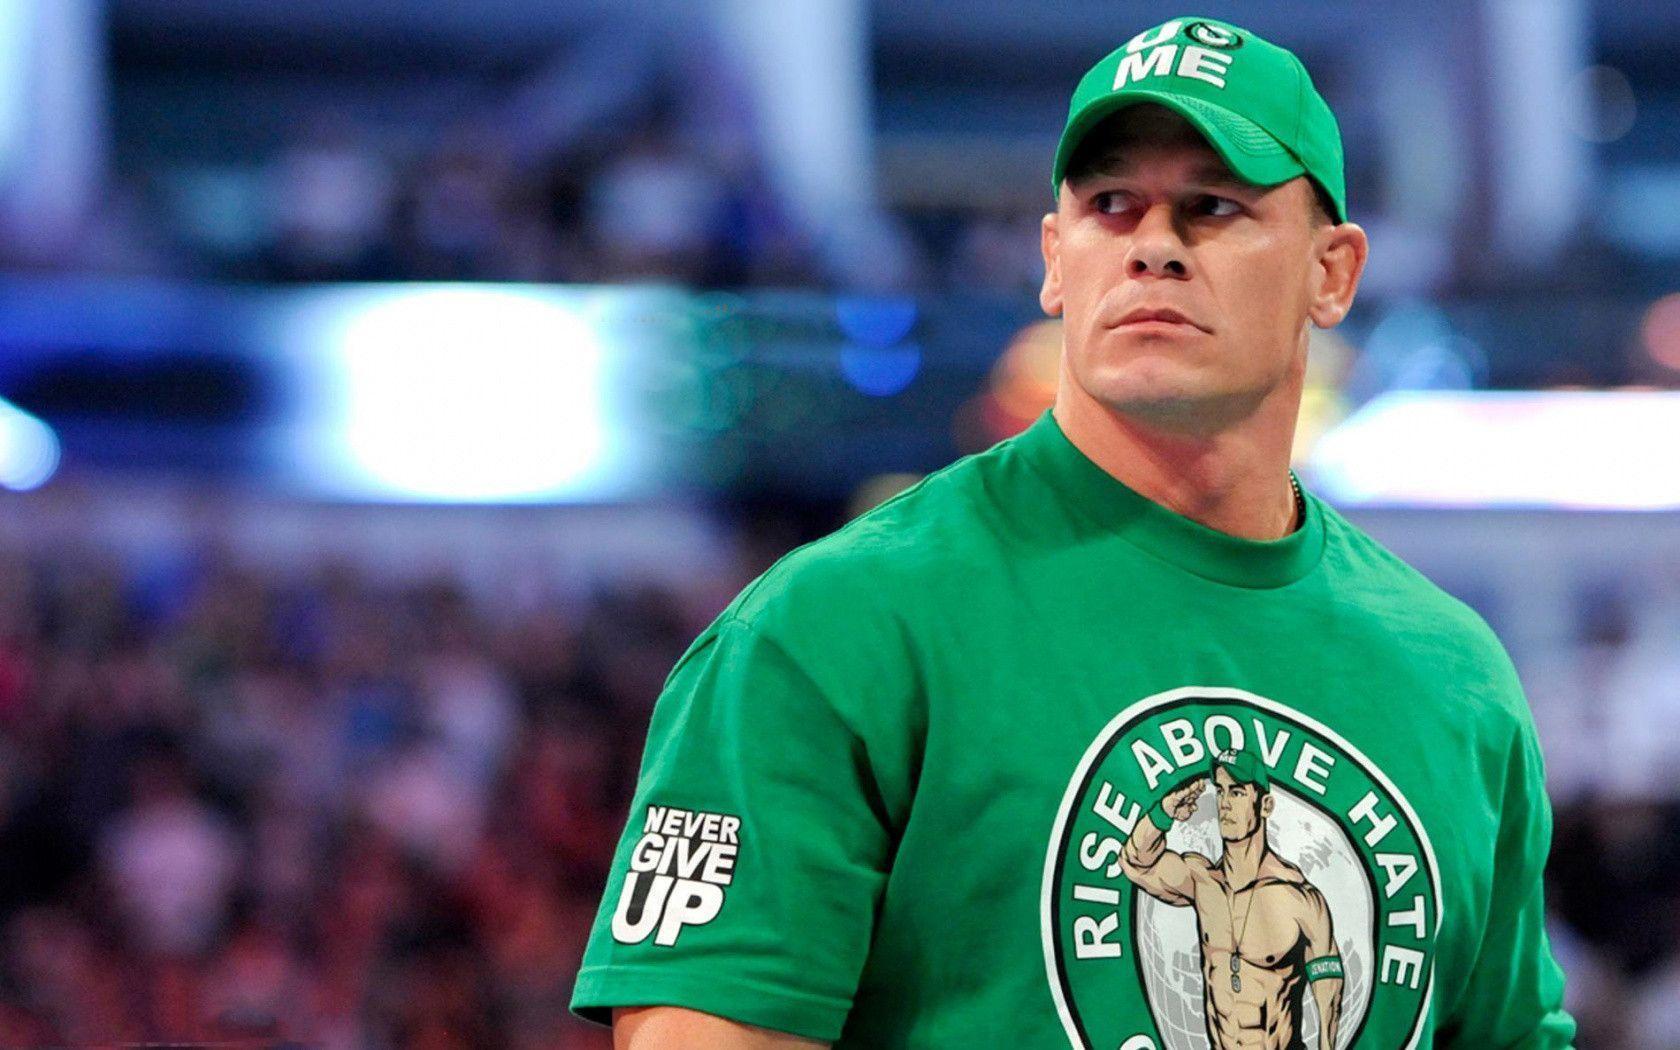 AmazingPict.com | John Cena Wallpaper Photos